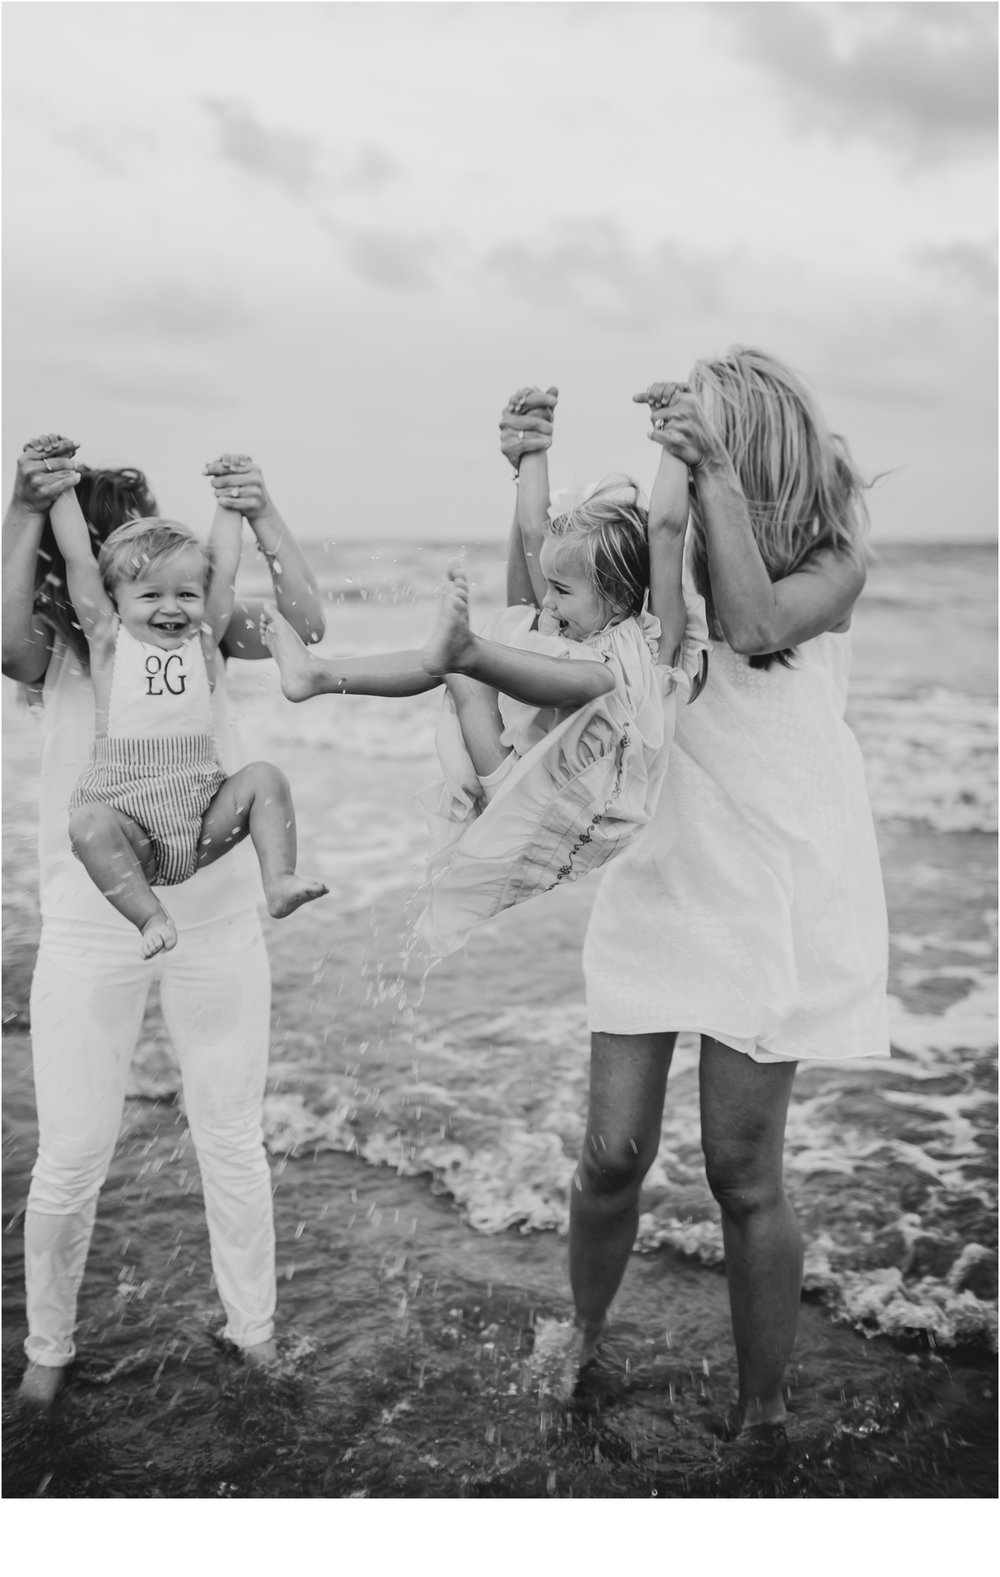 Rainey_Gregg_Photography_St._Simons_Island_Georgia_California_Wedding_Portrait_Photography_1200.jpg